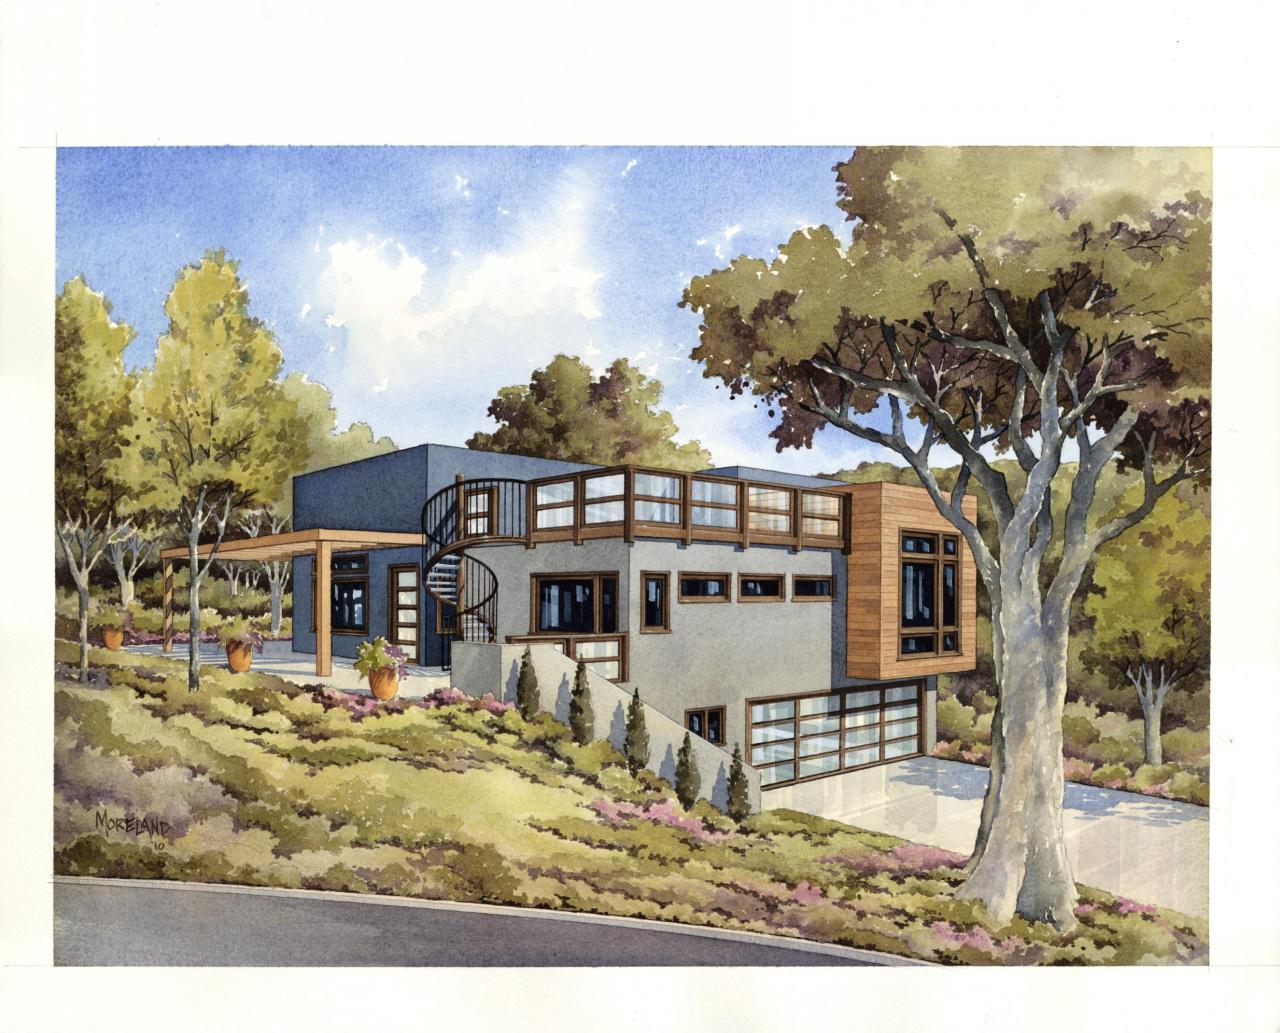 Property photo for 2695 Memory Ln Santa Barbara, California 93105 - 12-3662